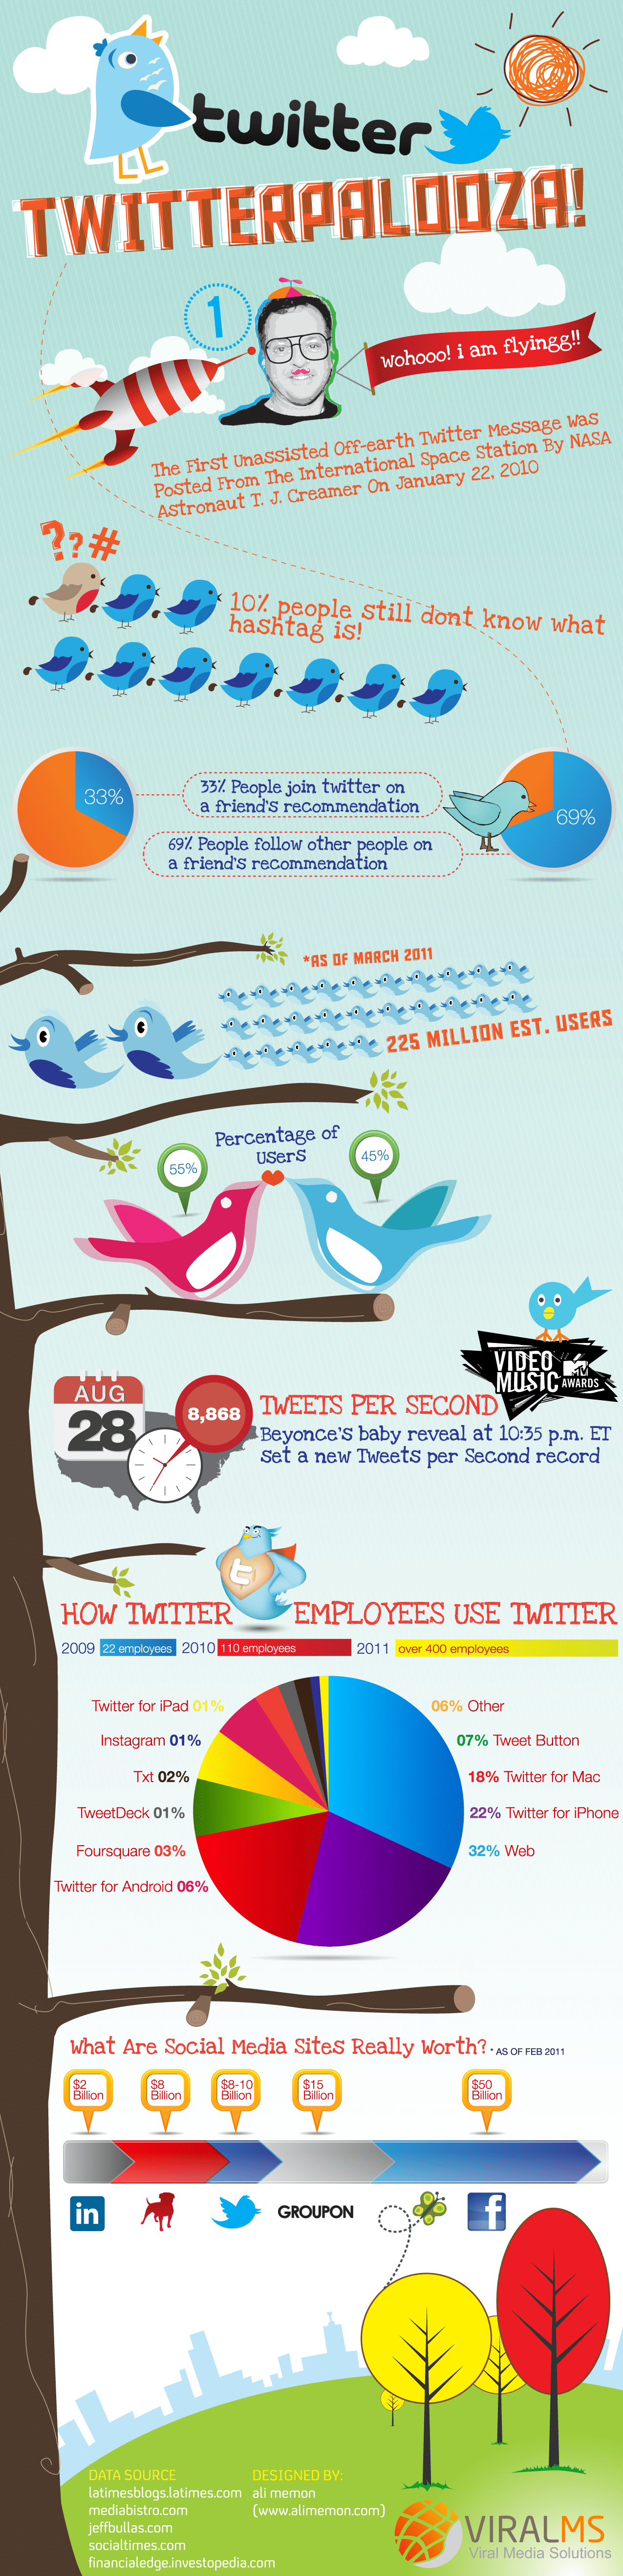 Twitter Statistics Infographic As Twitterpalooza